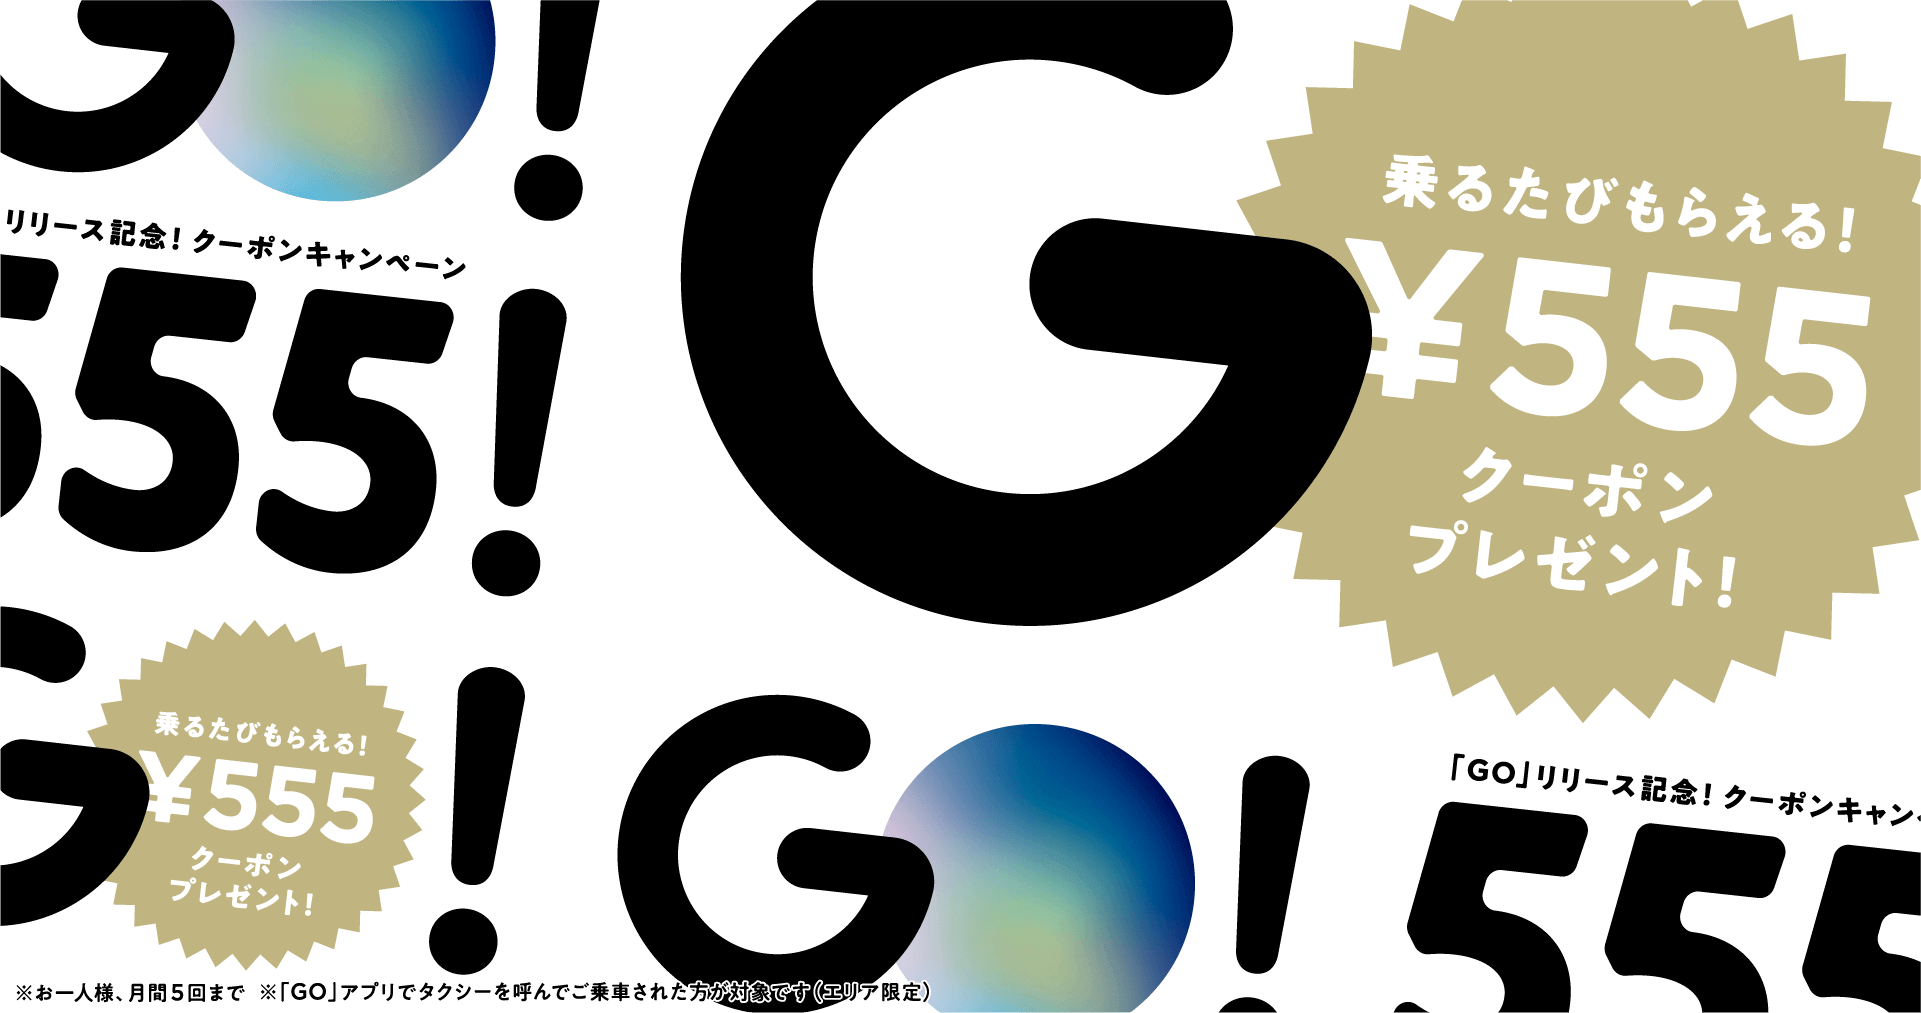 GOタクシークーポン最大8325円!初回以外でもOKリリース記念キャンペーン